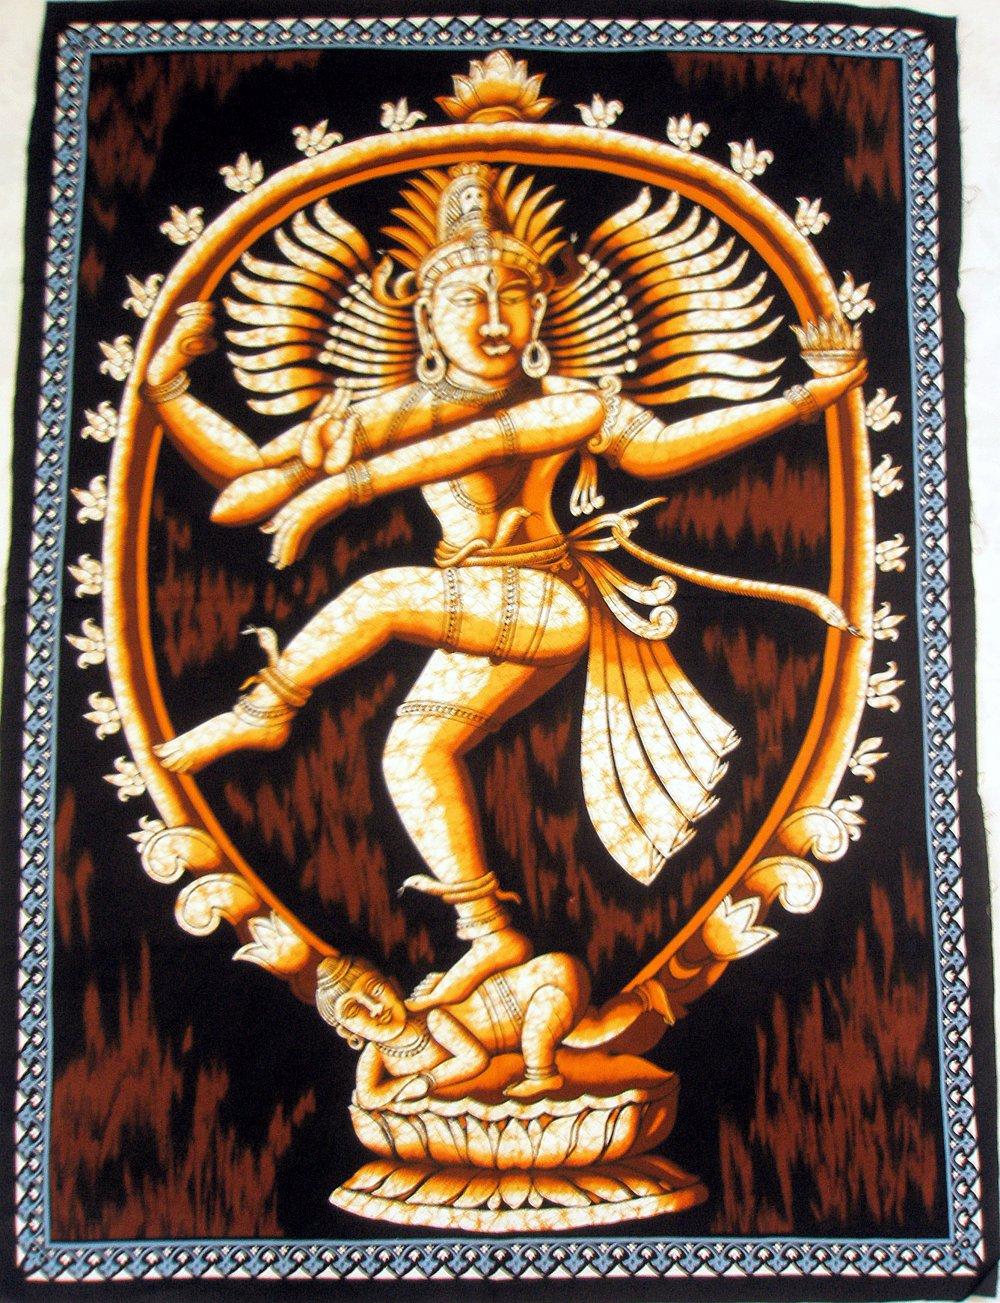 Batik Dancing Shiva Nataraja Wall Hanging Decor Cotton Large Tapestry India Ethnic Vintage Art